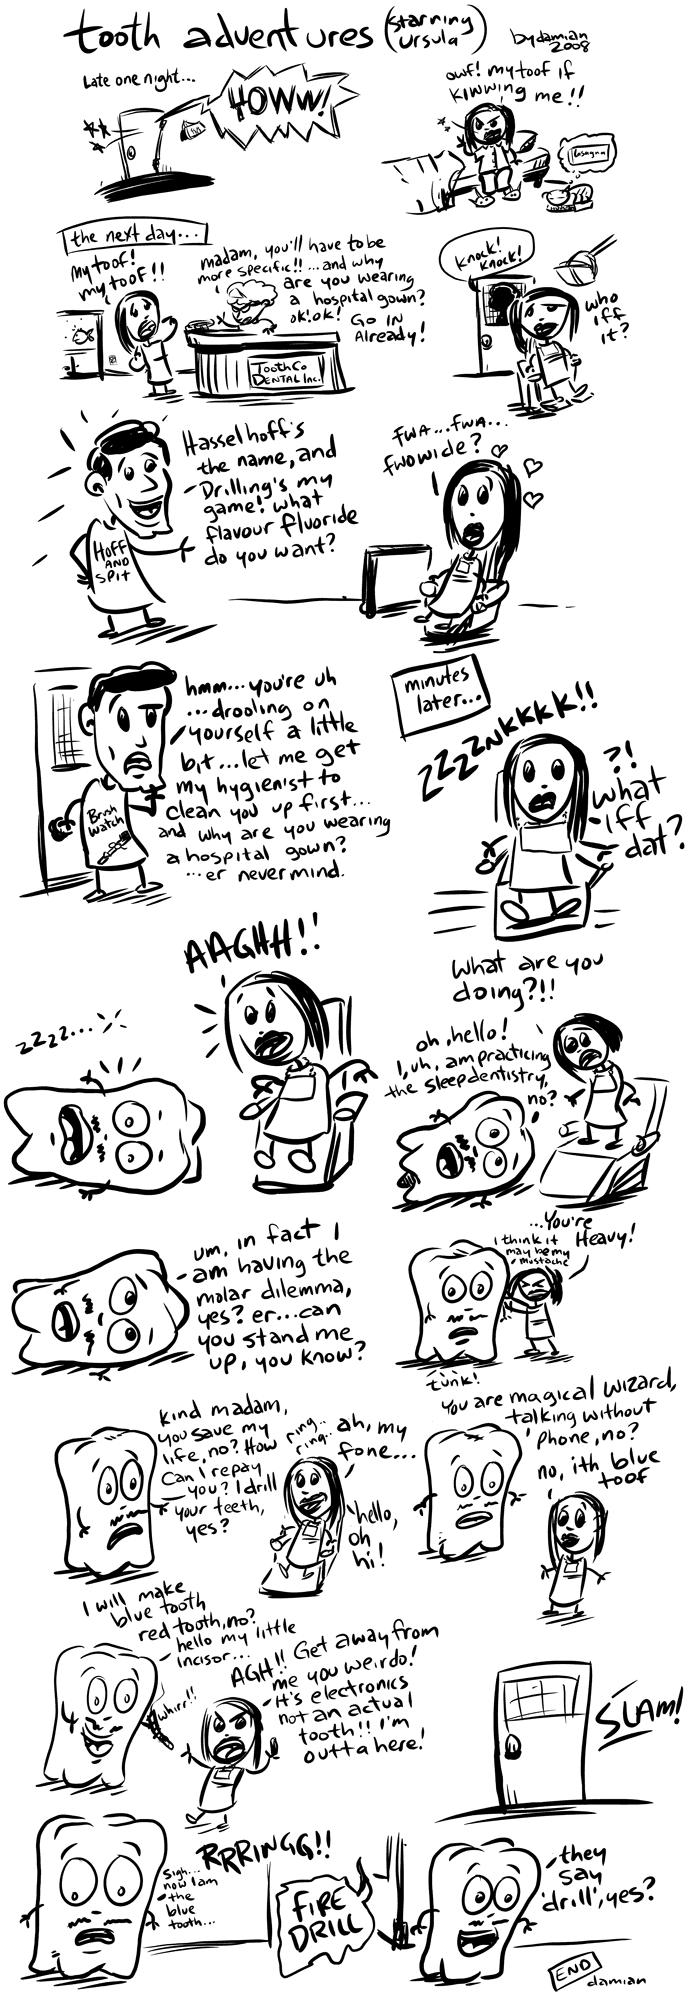 Sketchbook – Tooth adventures #5